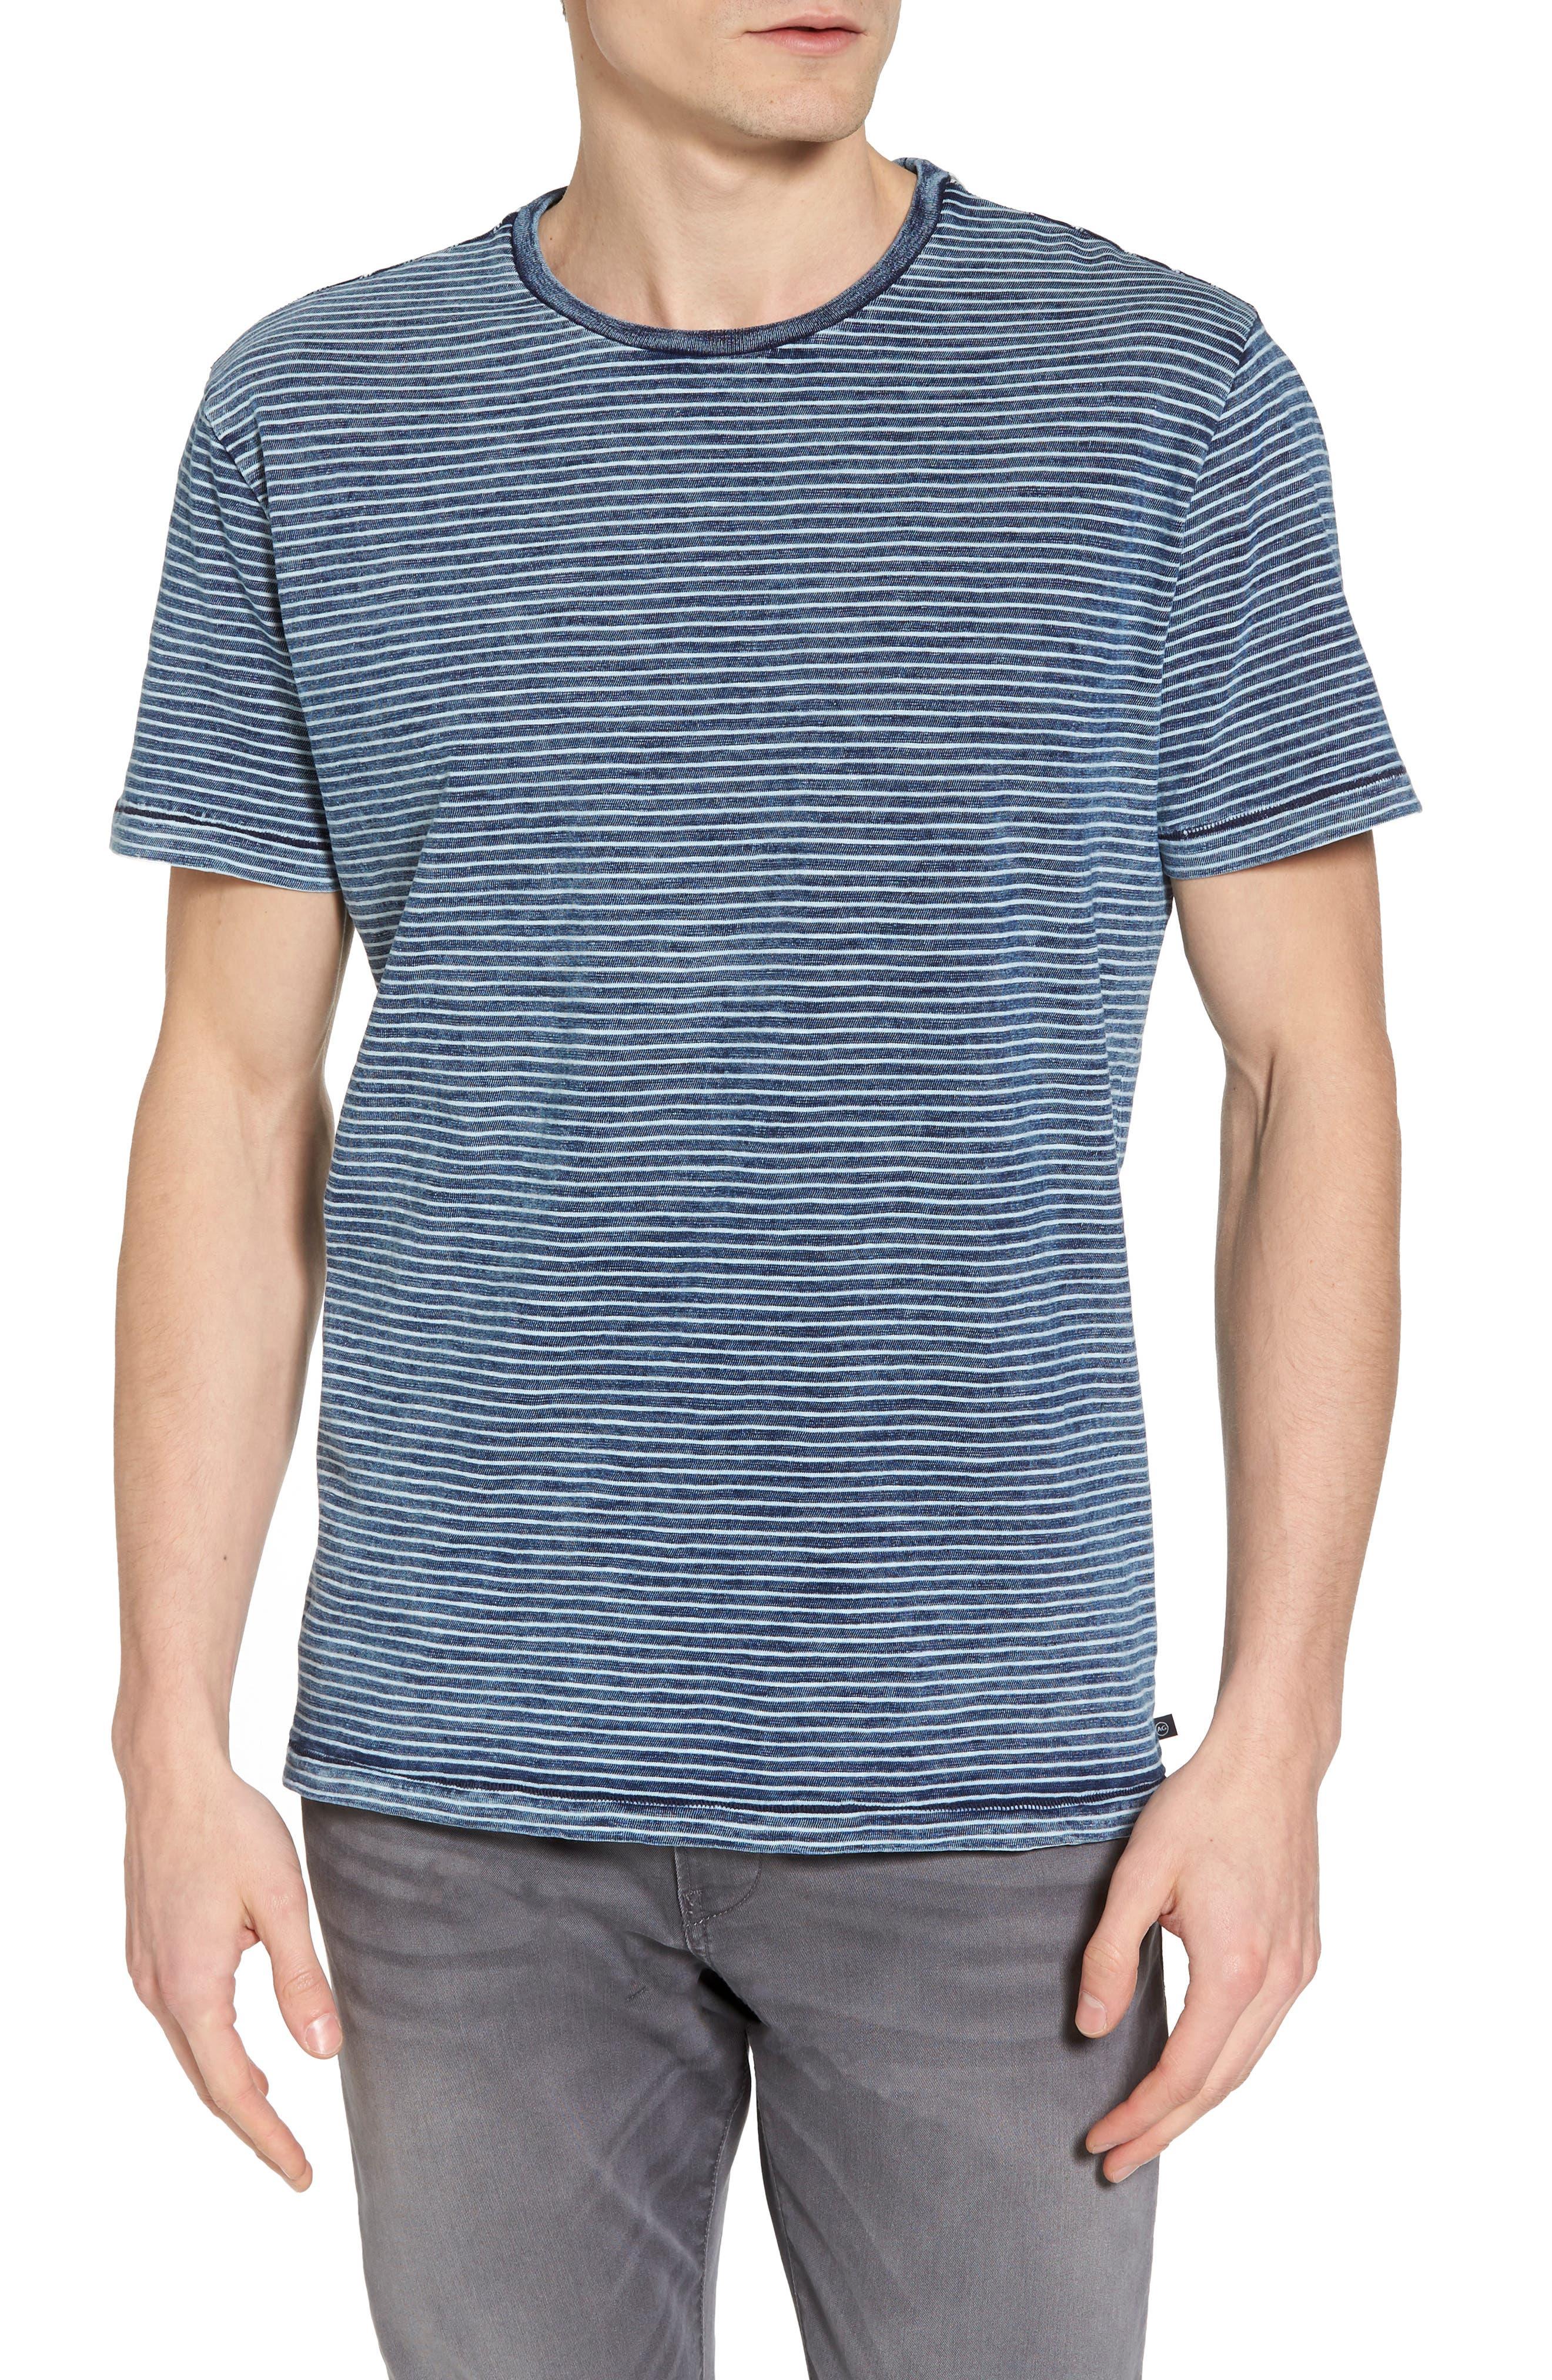 Julian Slim Fit Crewneck Shirt,                         Main,                         color, Marbled Indigo/ White Stripe